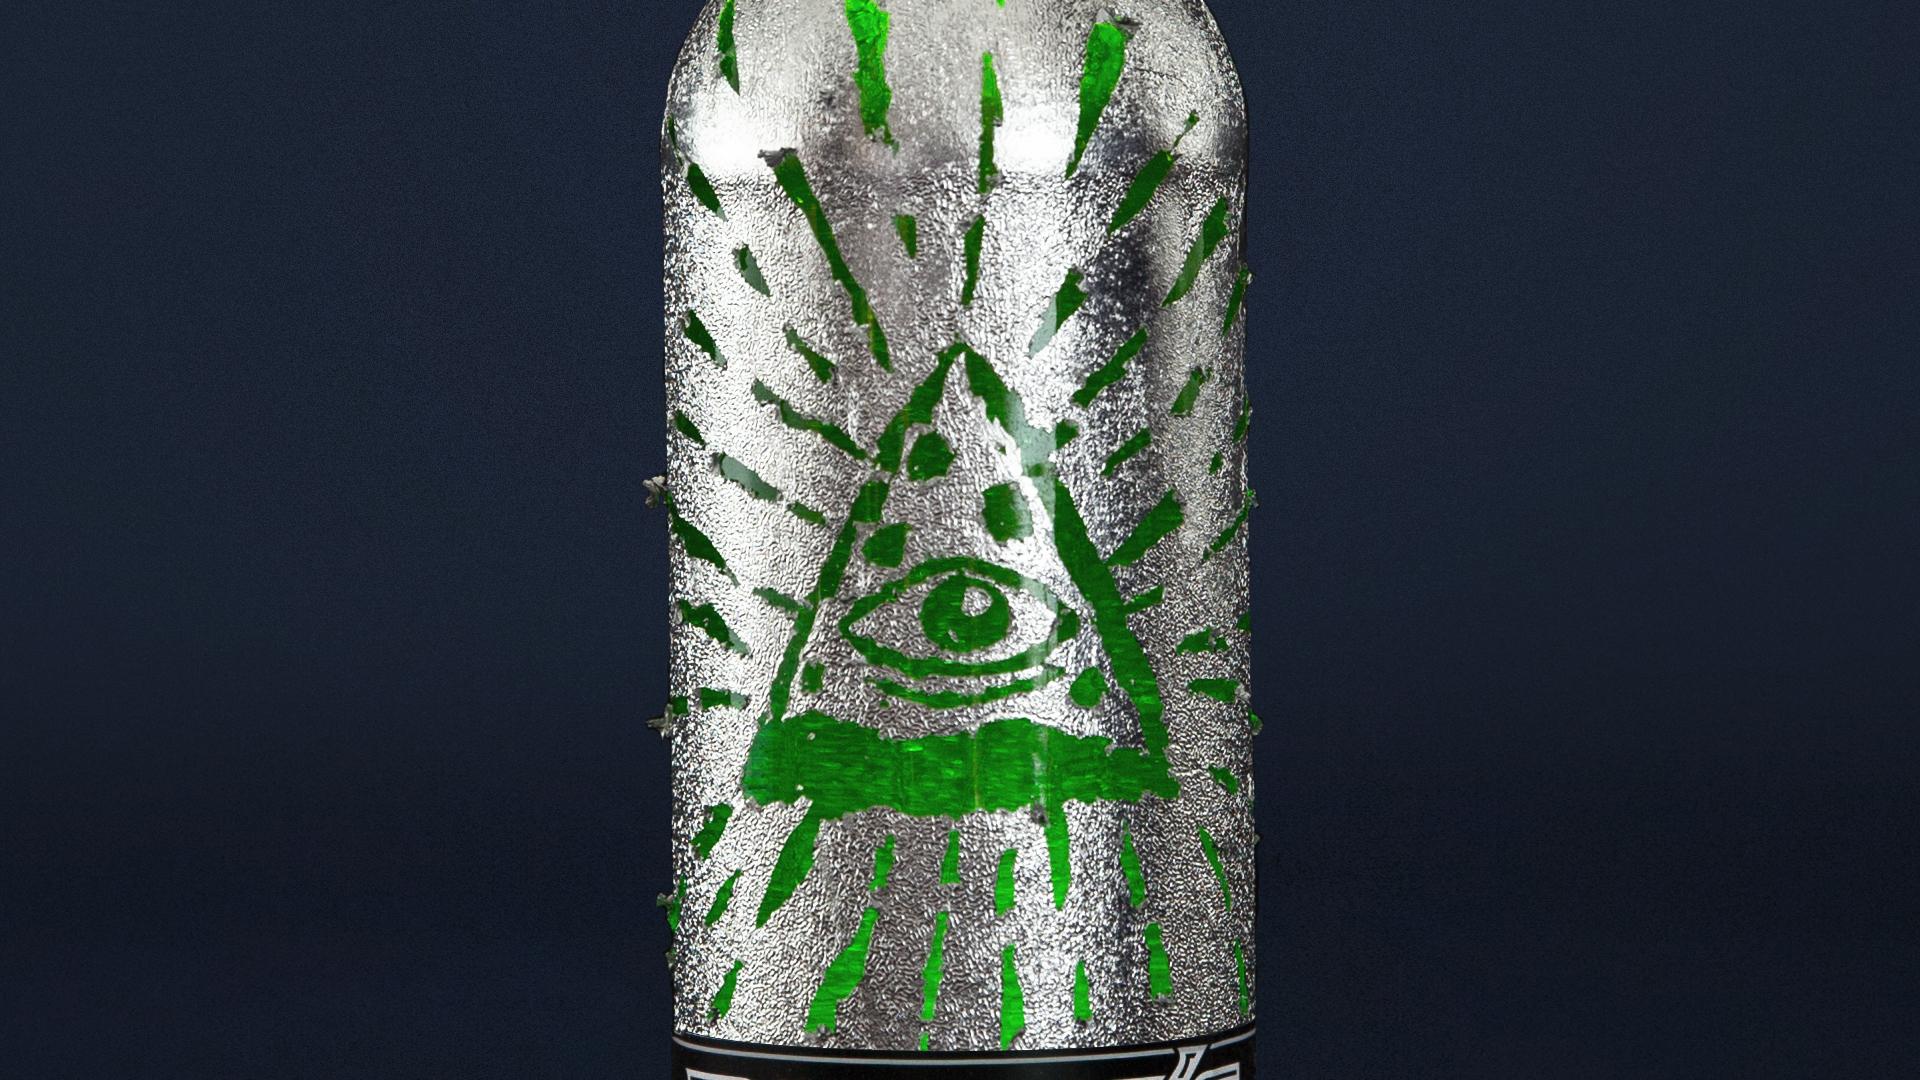 illuminati_close_up.jpg